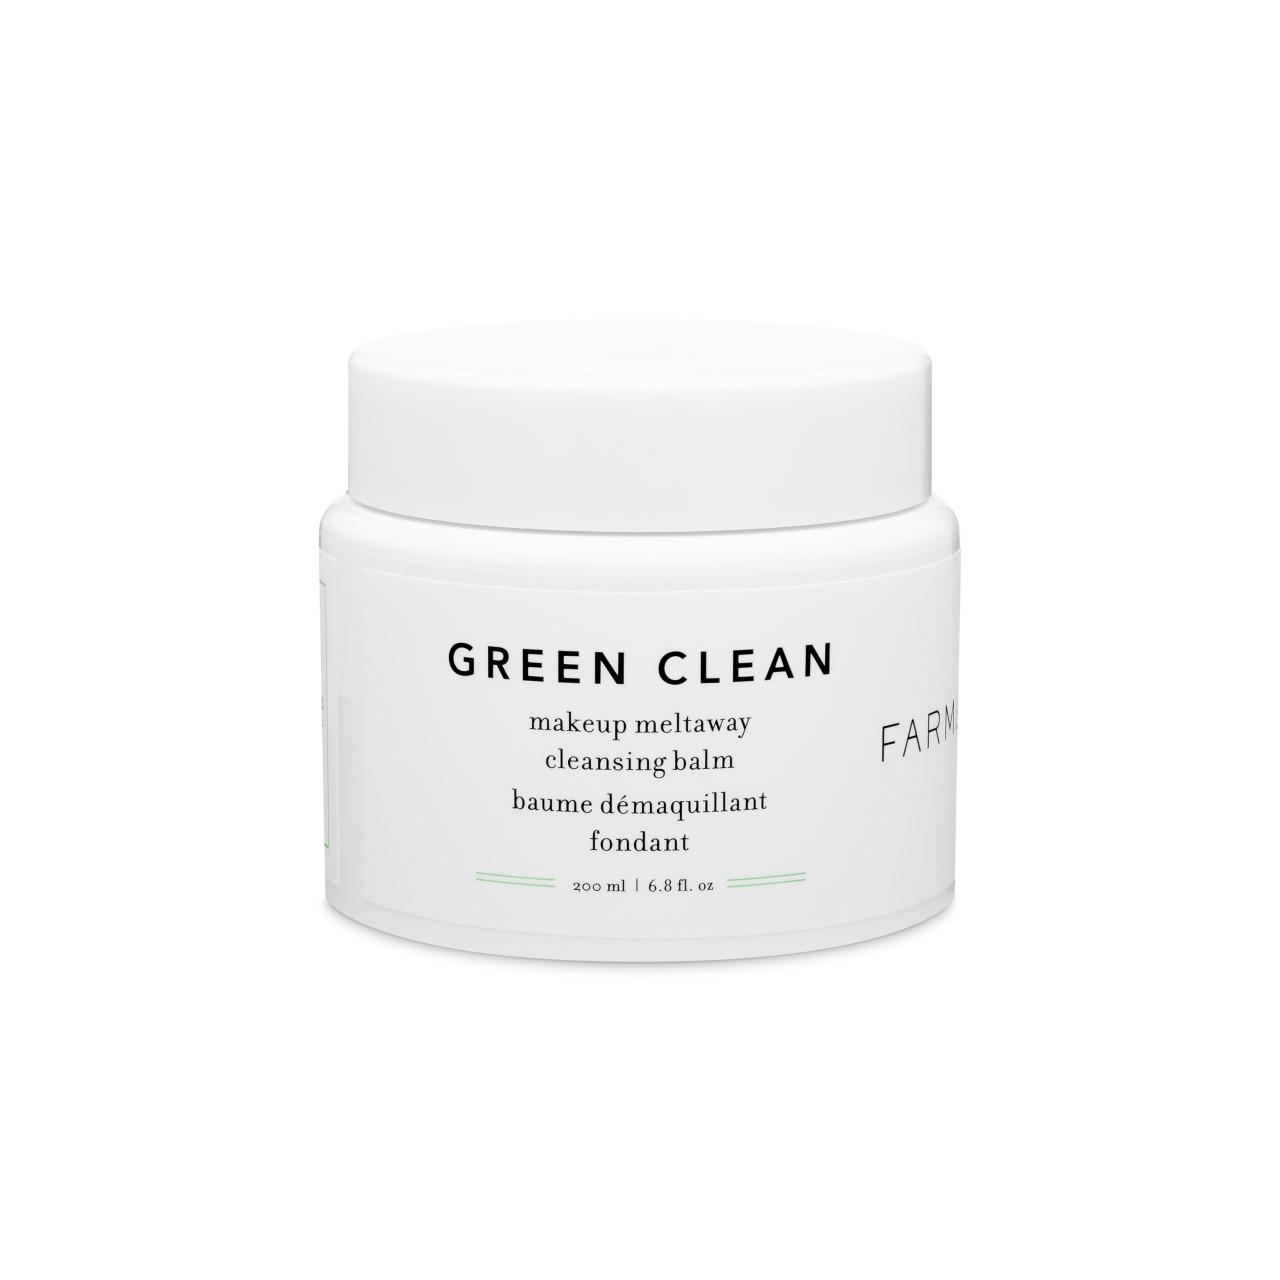 Farmacy Green clean amazon